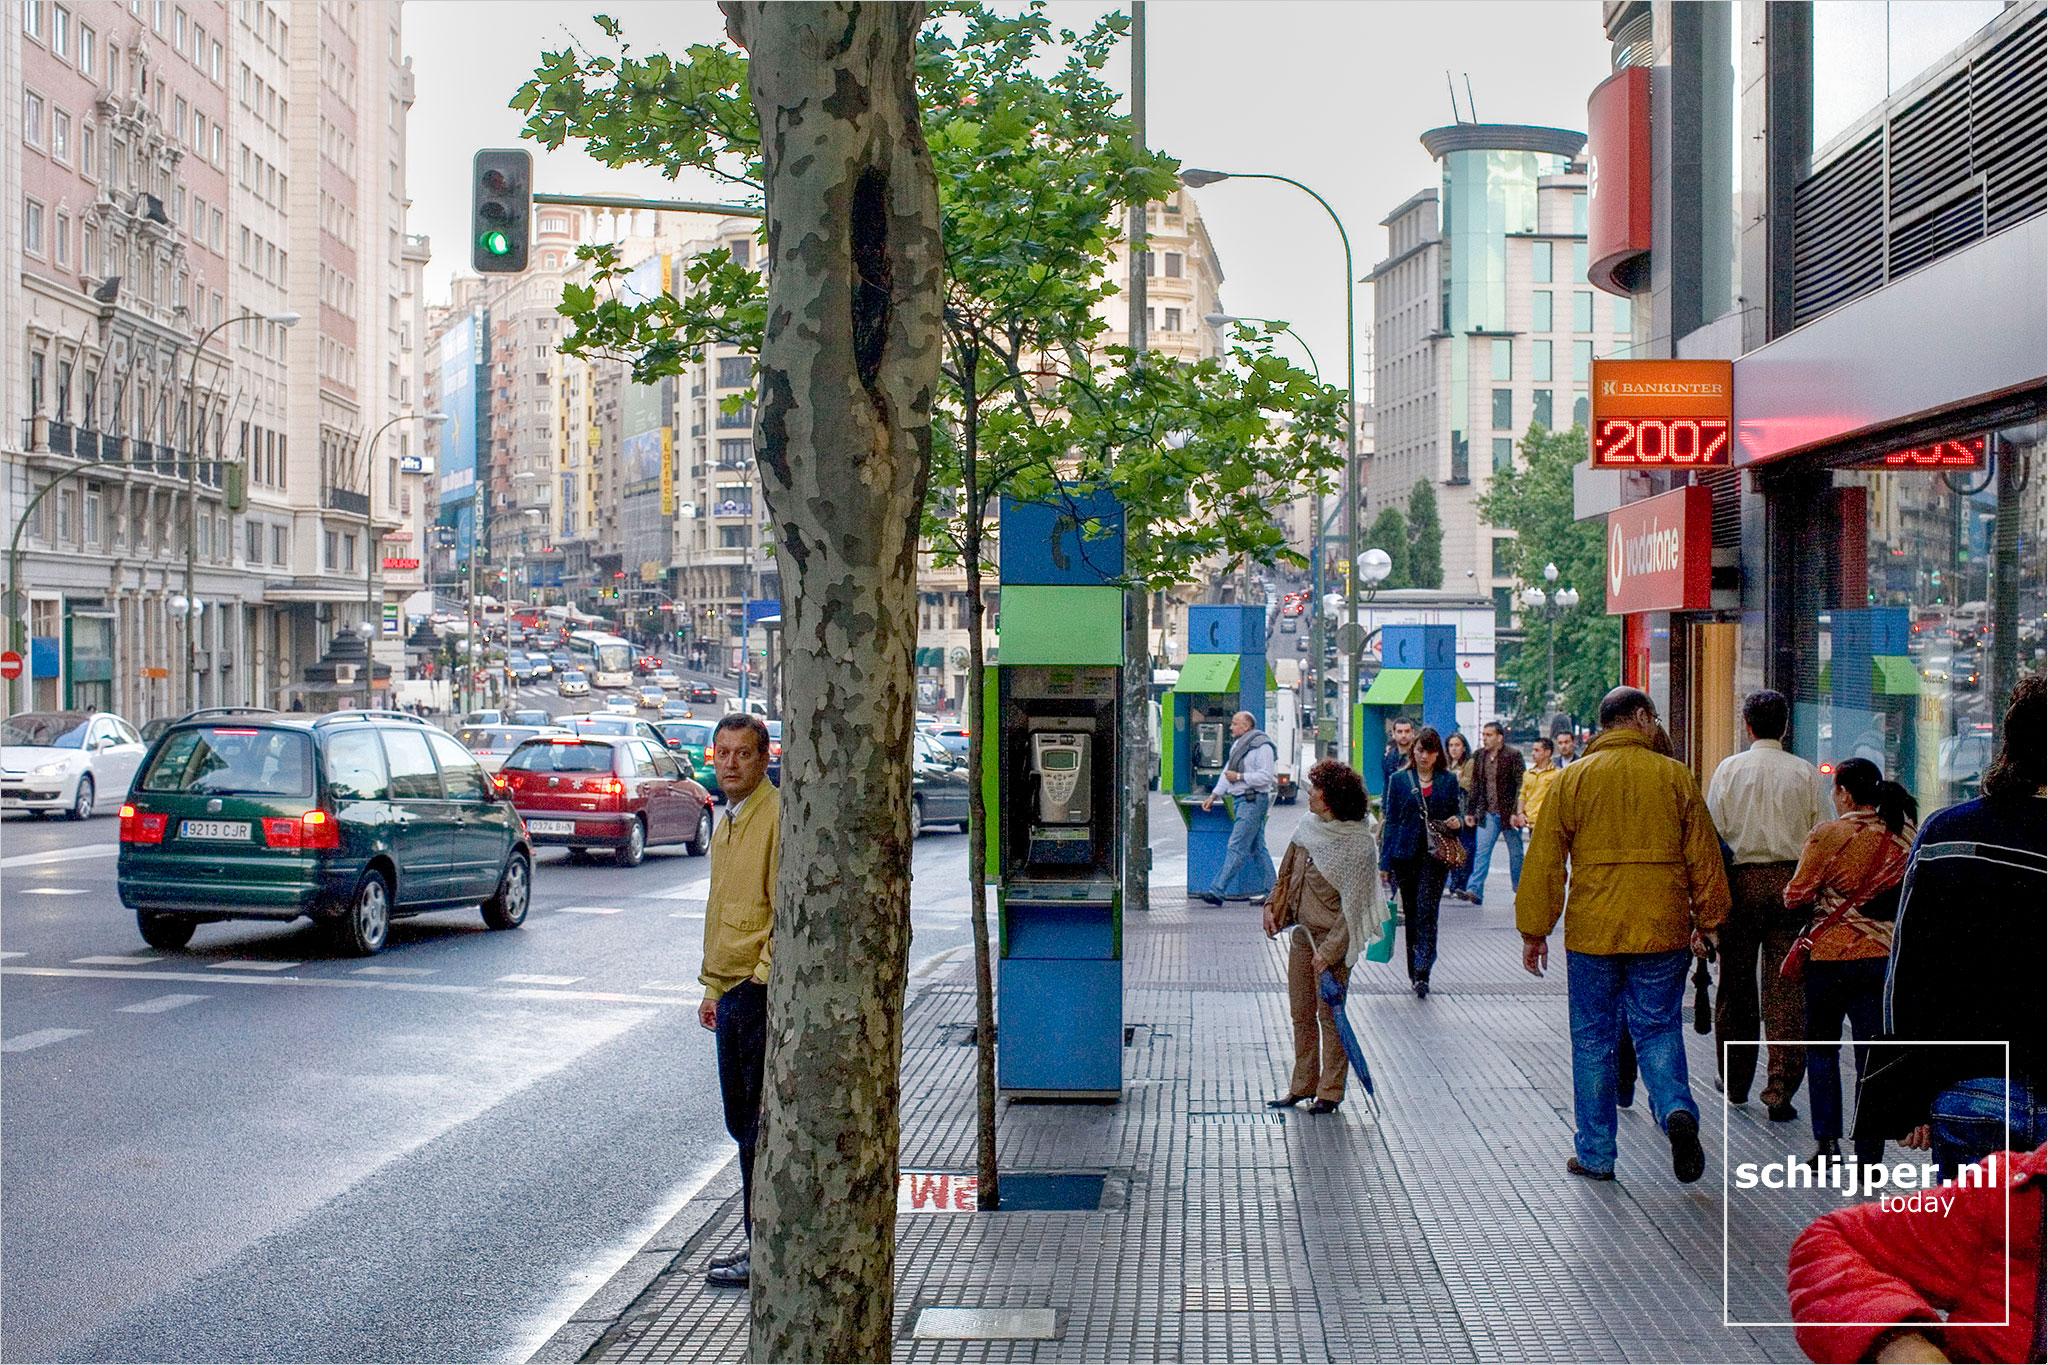 Spanje, Madrid, 24 mei 2007